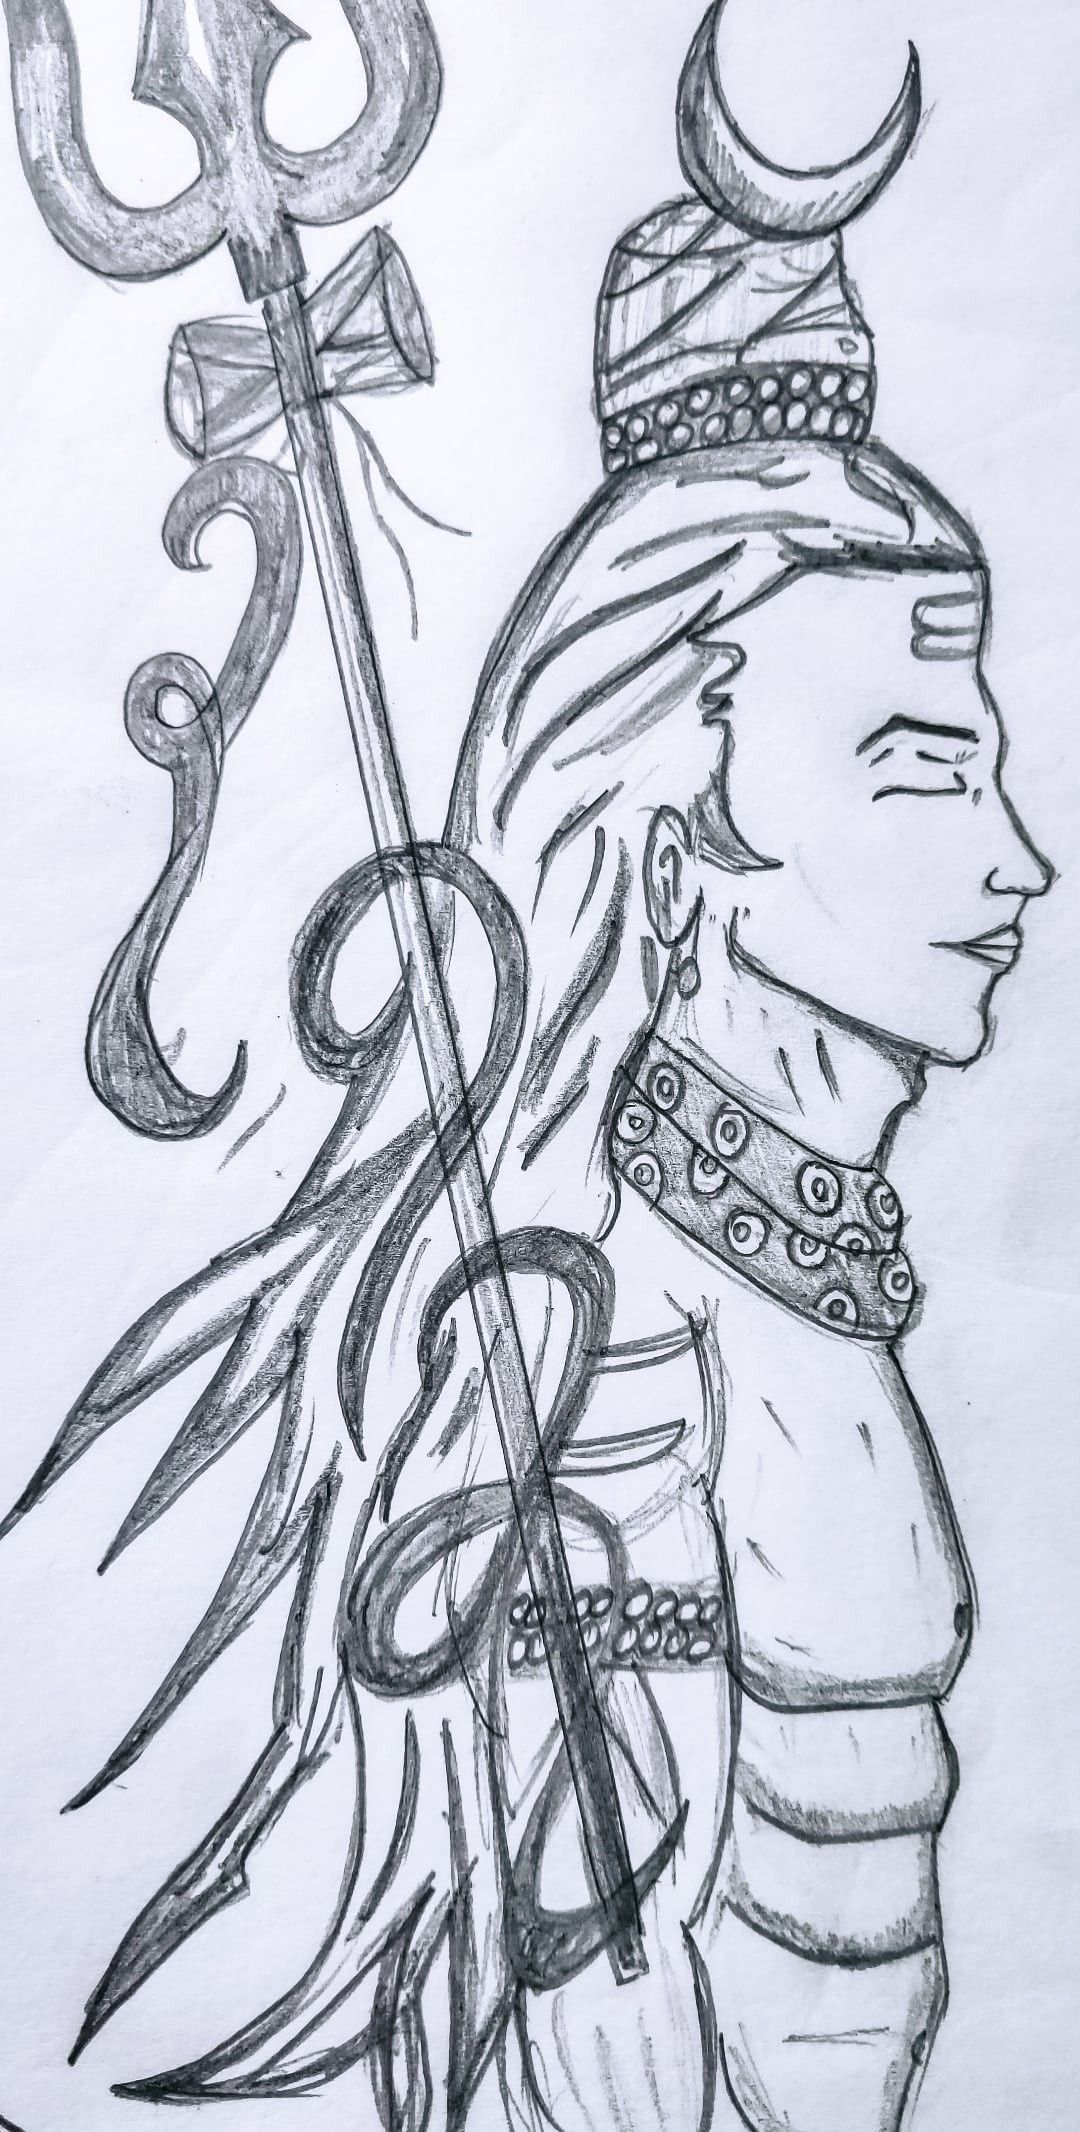 Lord Shiva Sketch Lord Shiva Sketch Abstract Pencil Drawings Shiva Tattoo Design